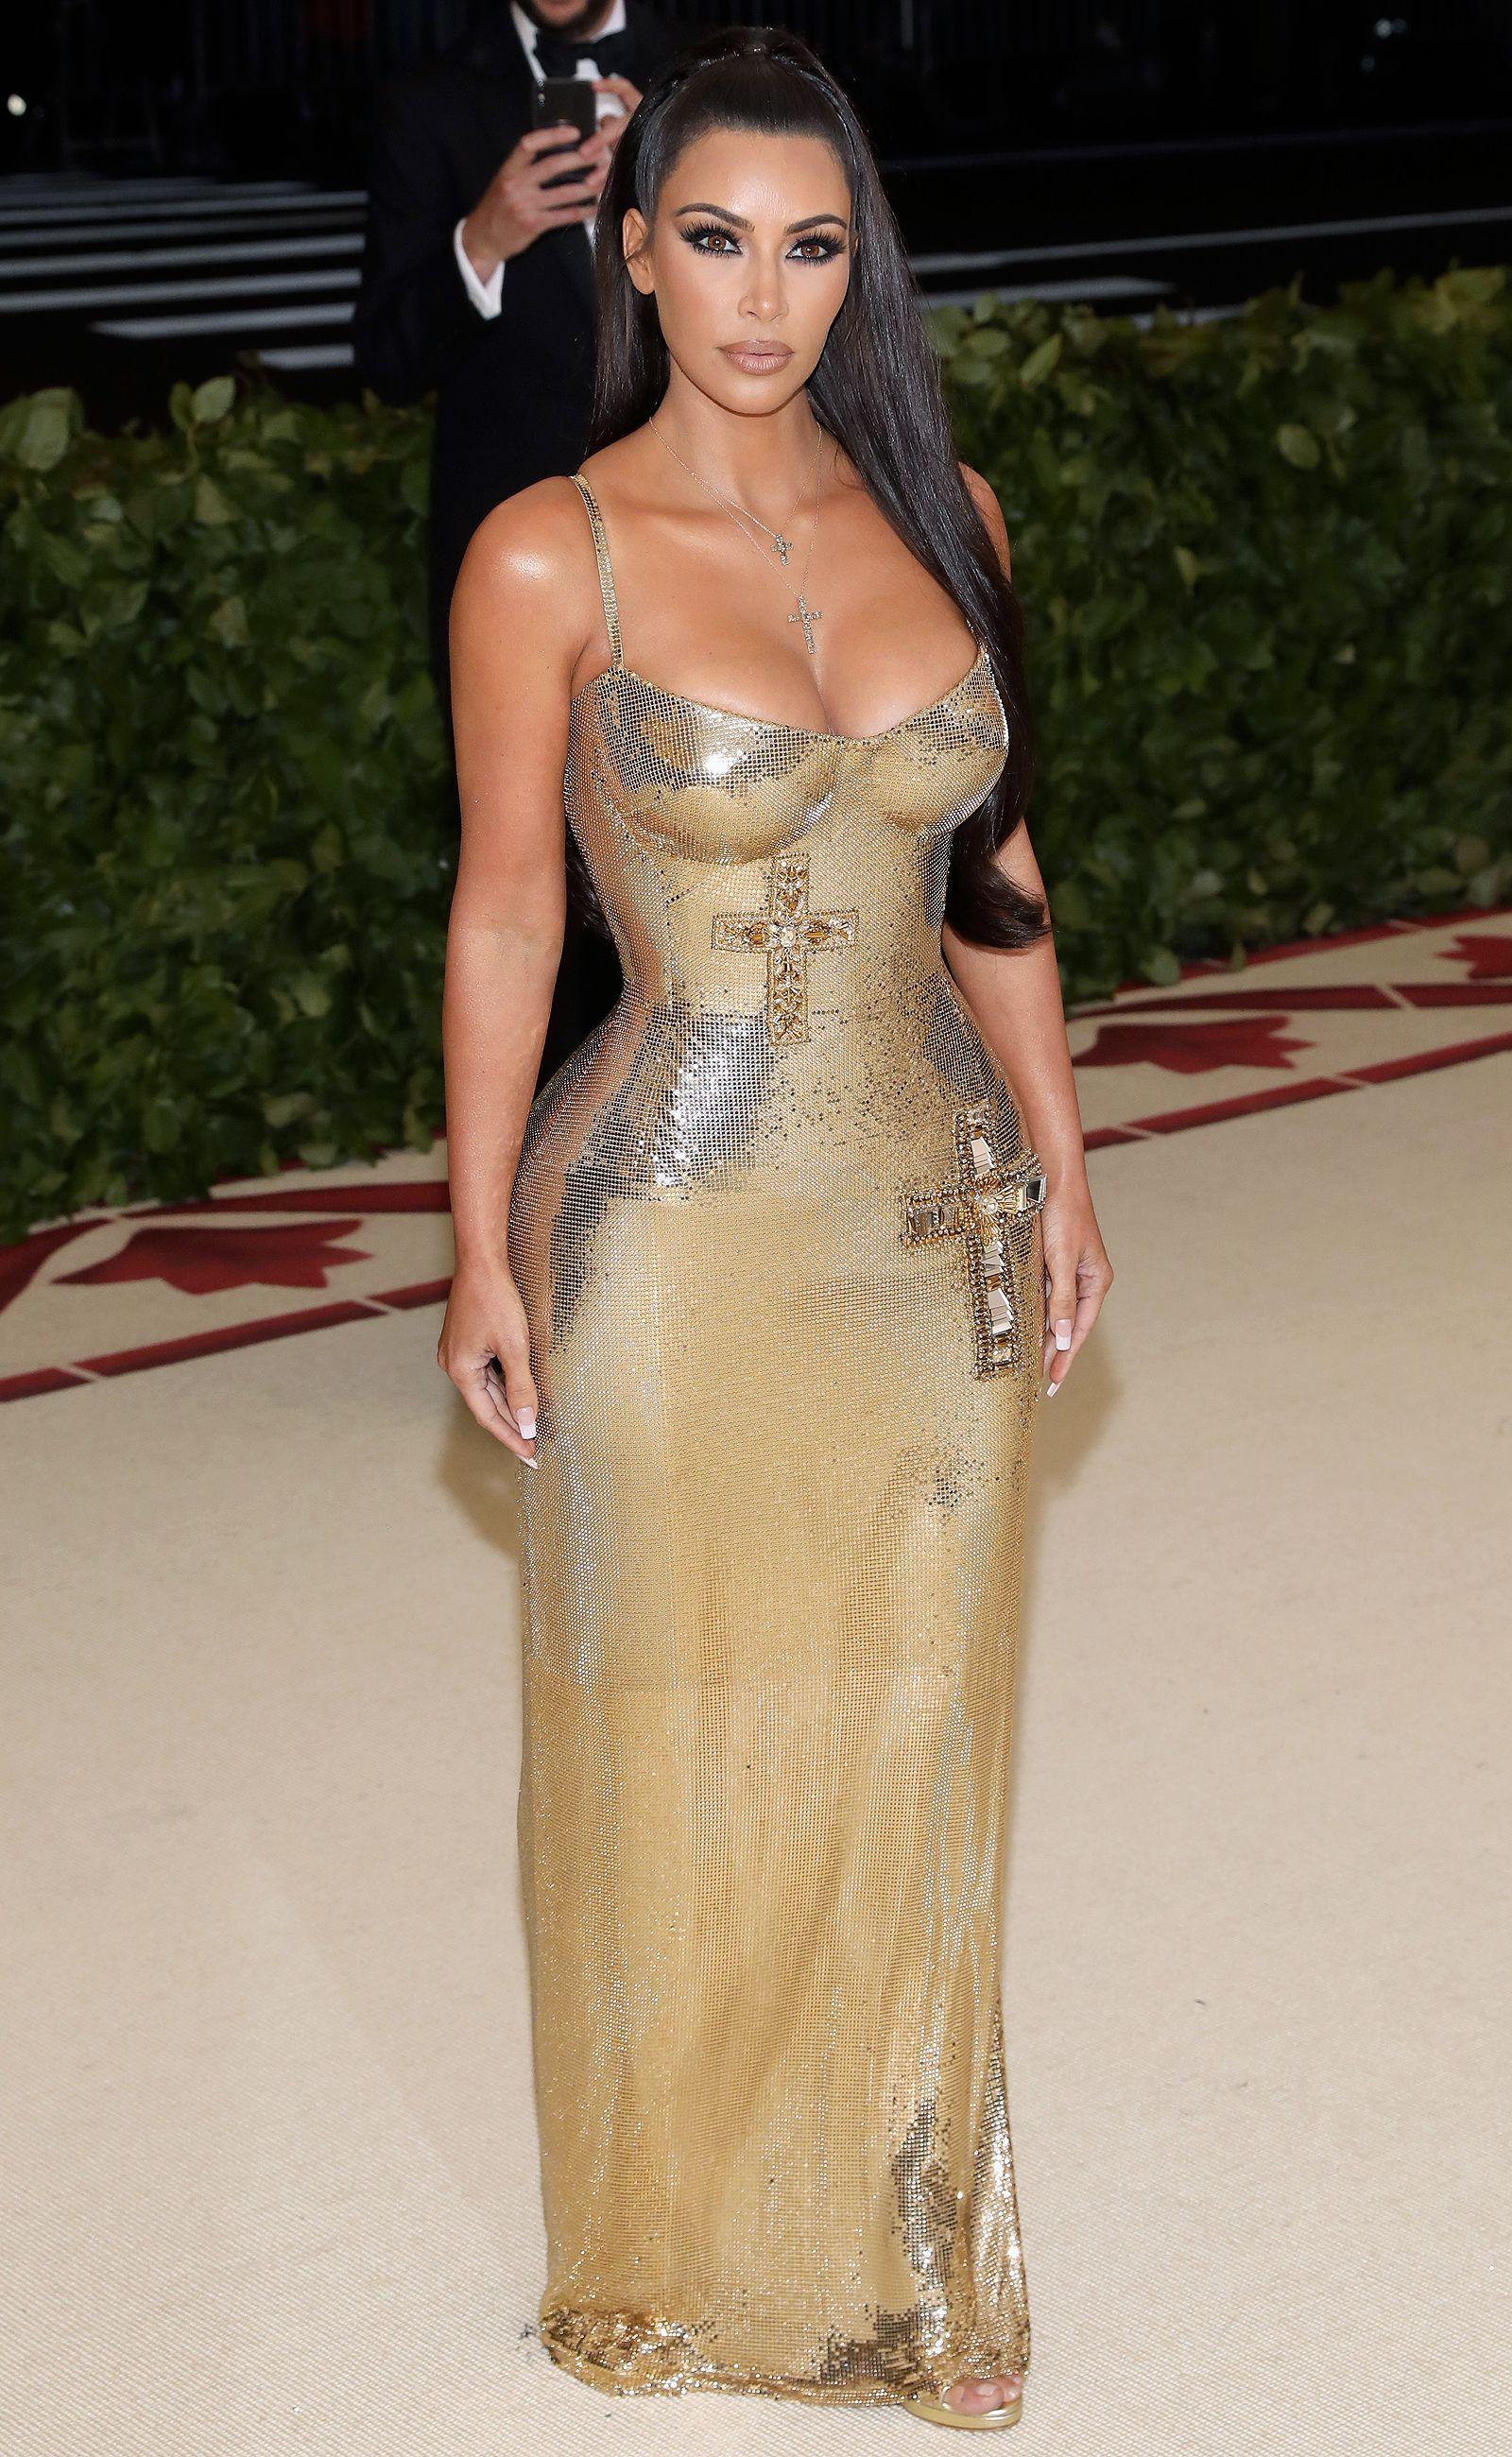 ' Kanye Kim Kardashian Attends 2018 Met Gala Solo